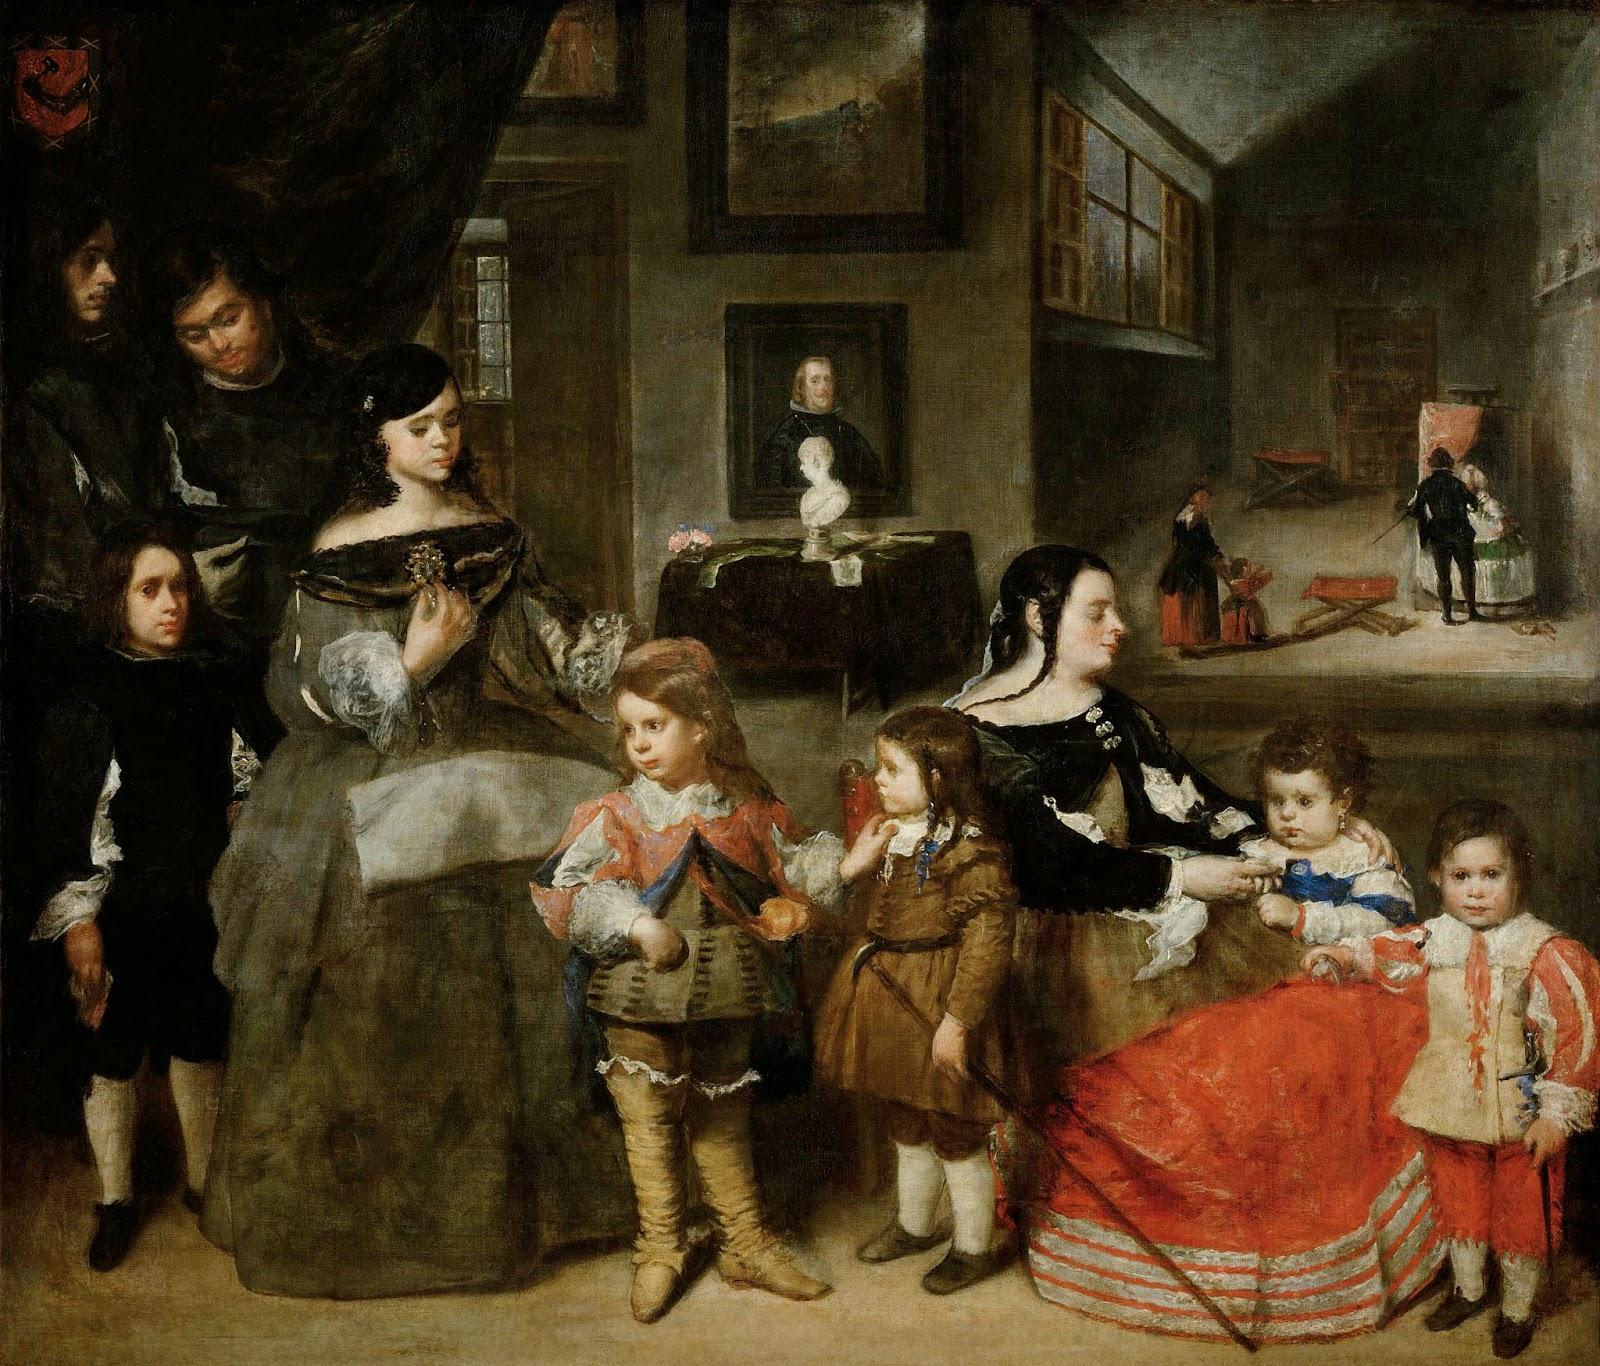 Archivo:La familia del pintor Juan Bautista Martínez del Mazo.jpg